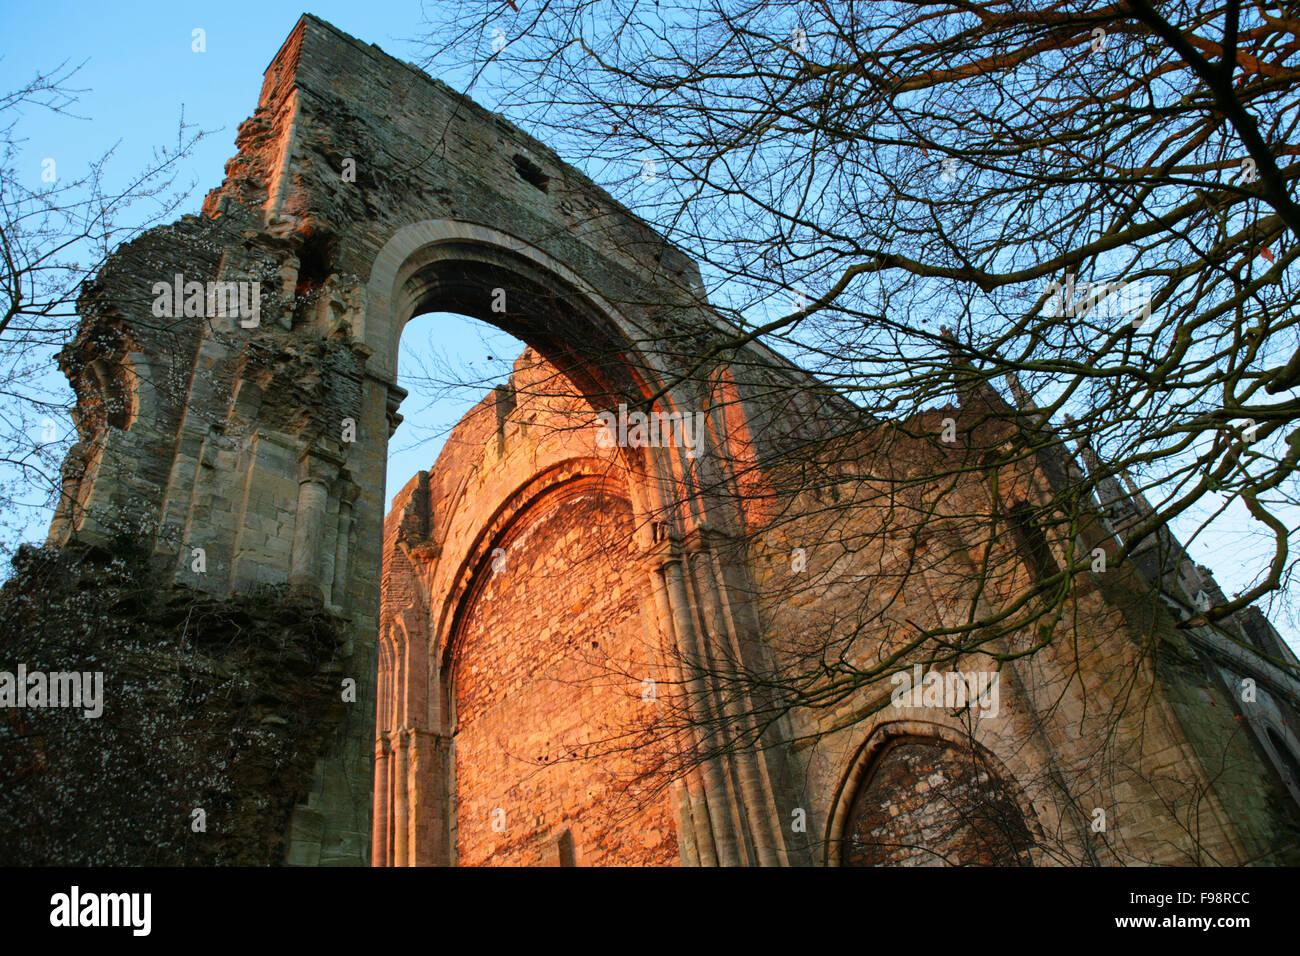 Malmesbury Abbey in Wiltshire - Stock Image